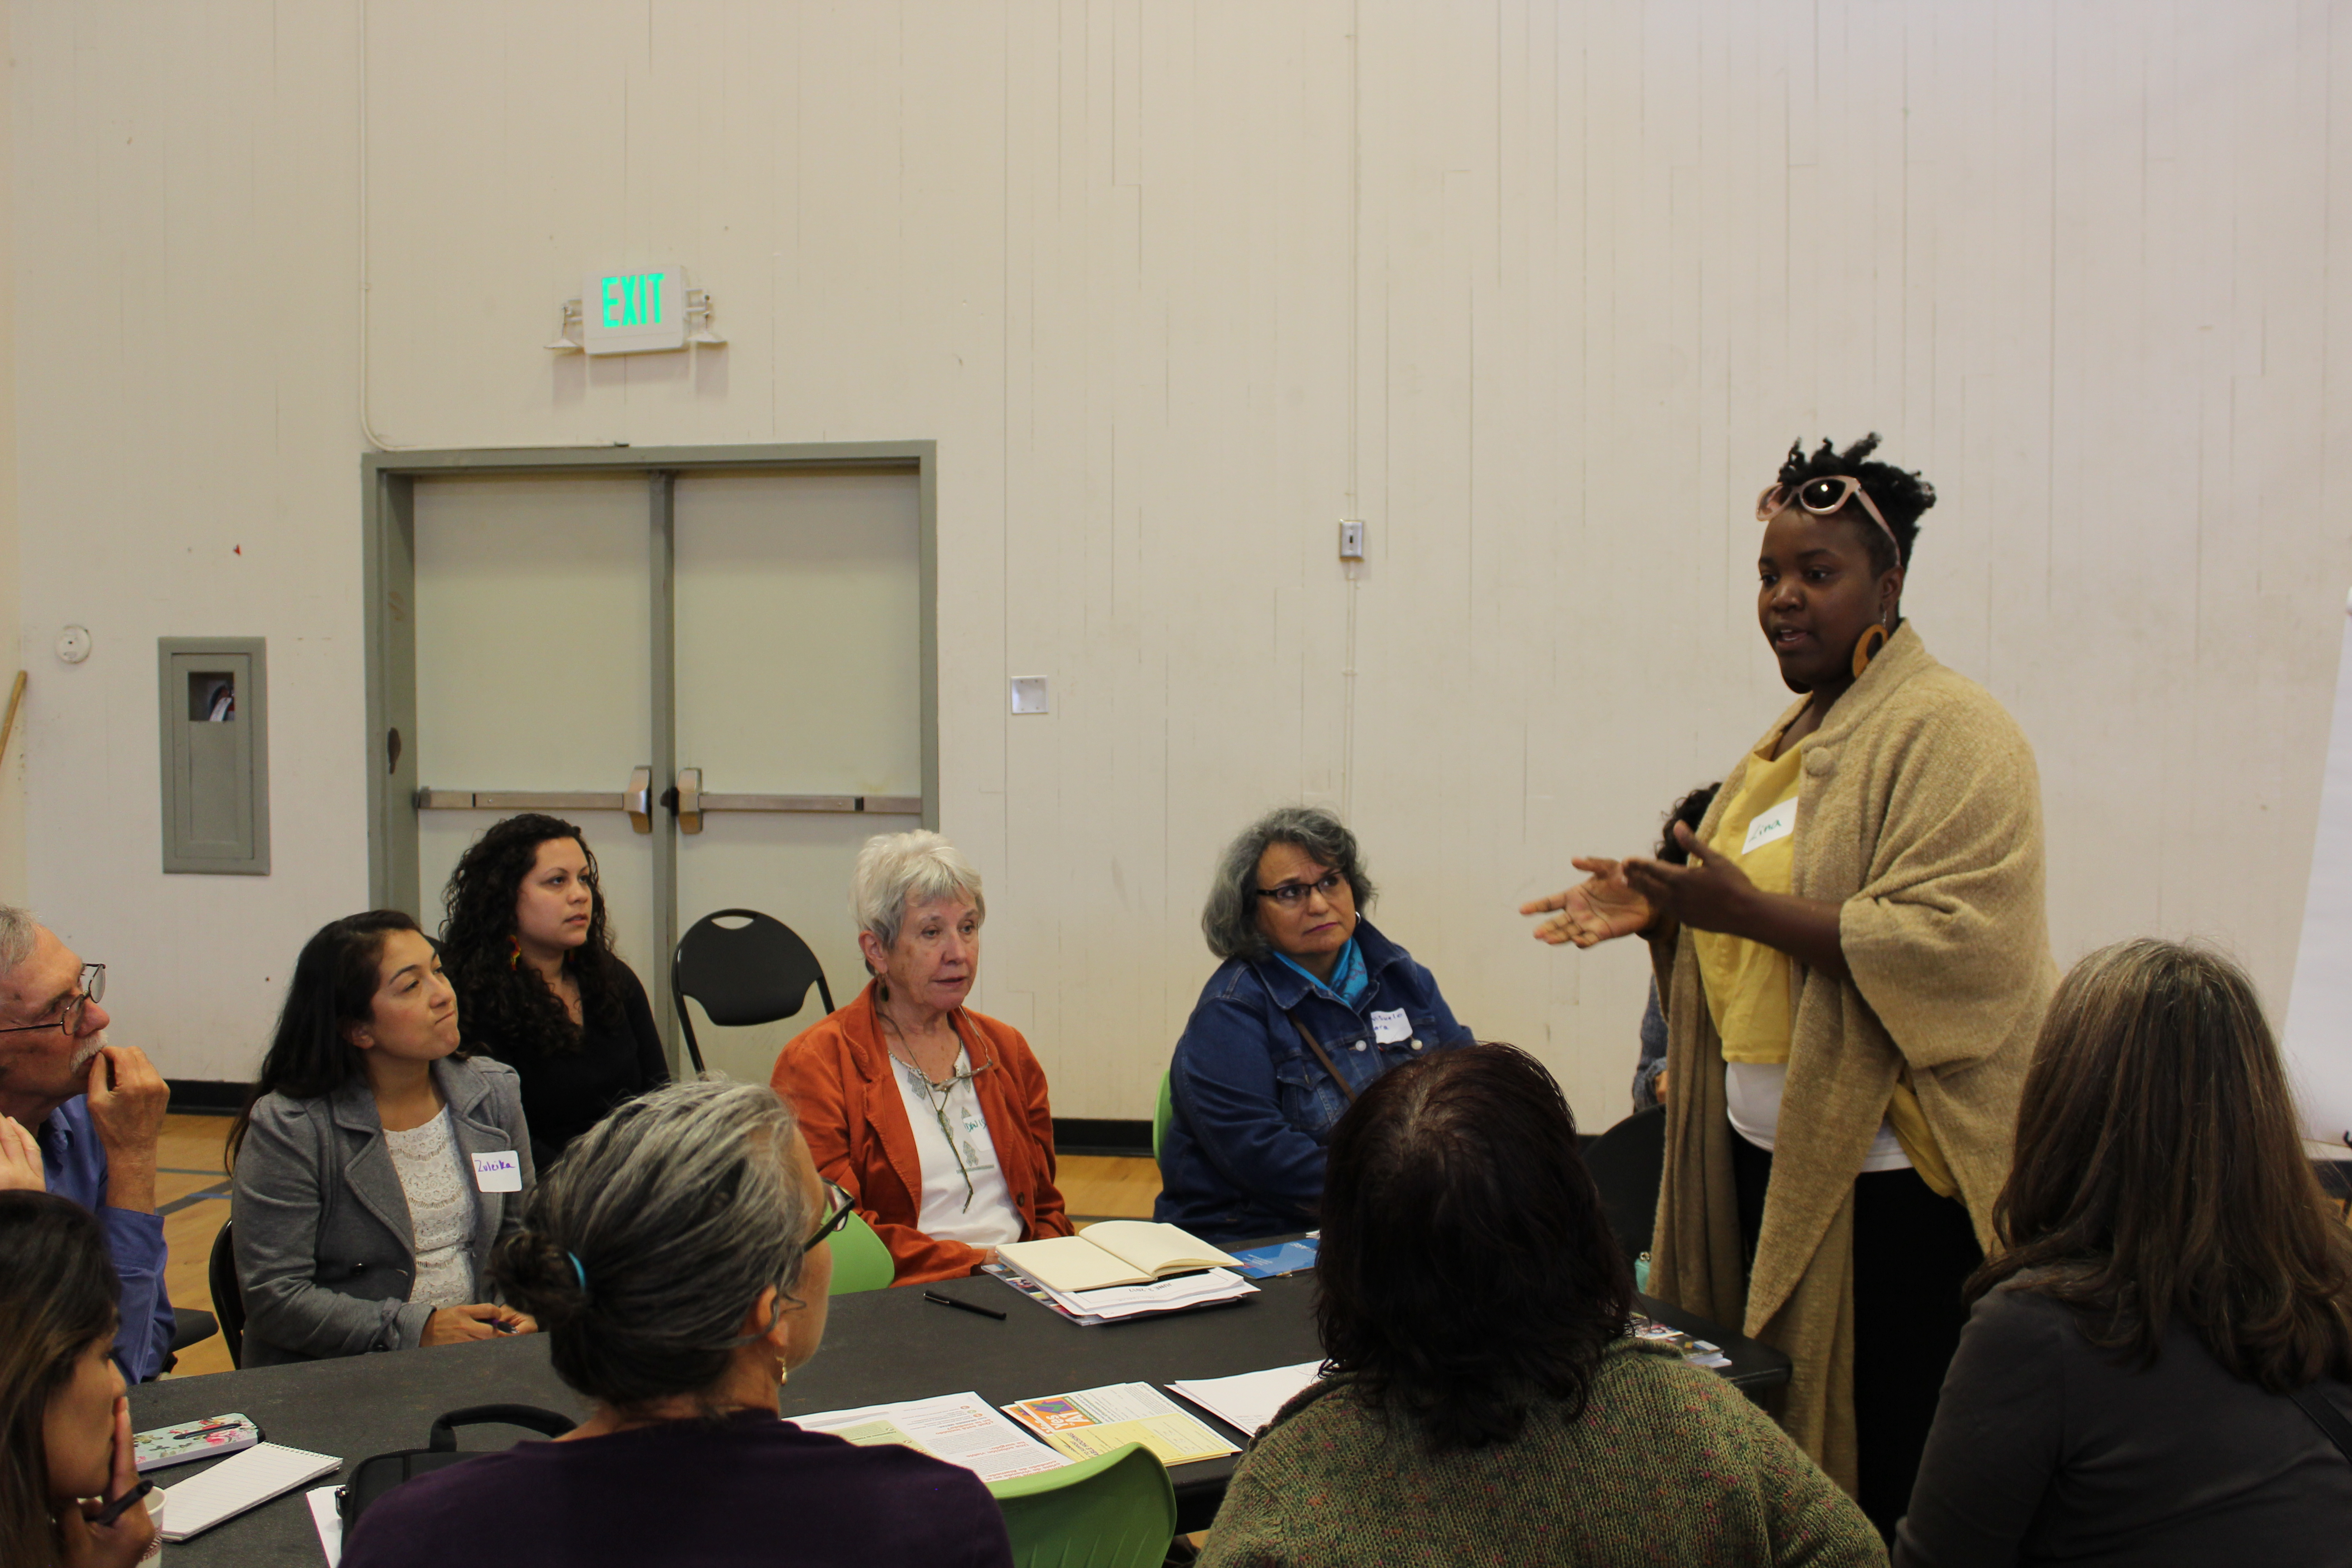 Participants at the Richmond Housing Symposium